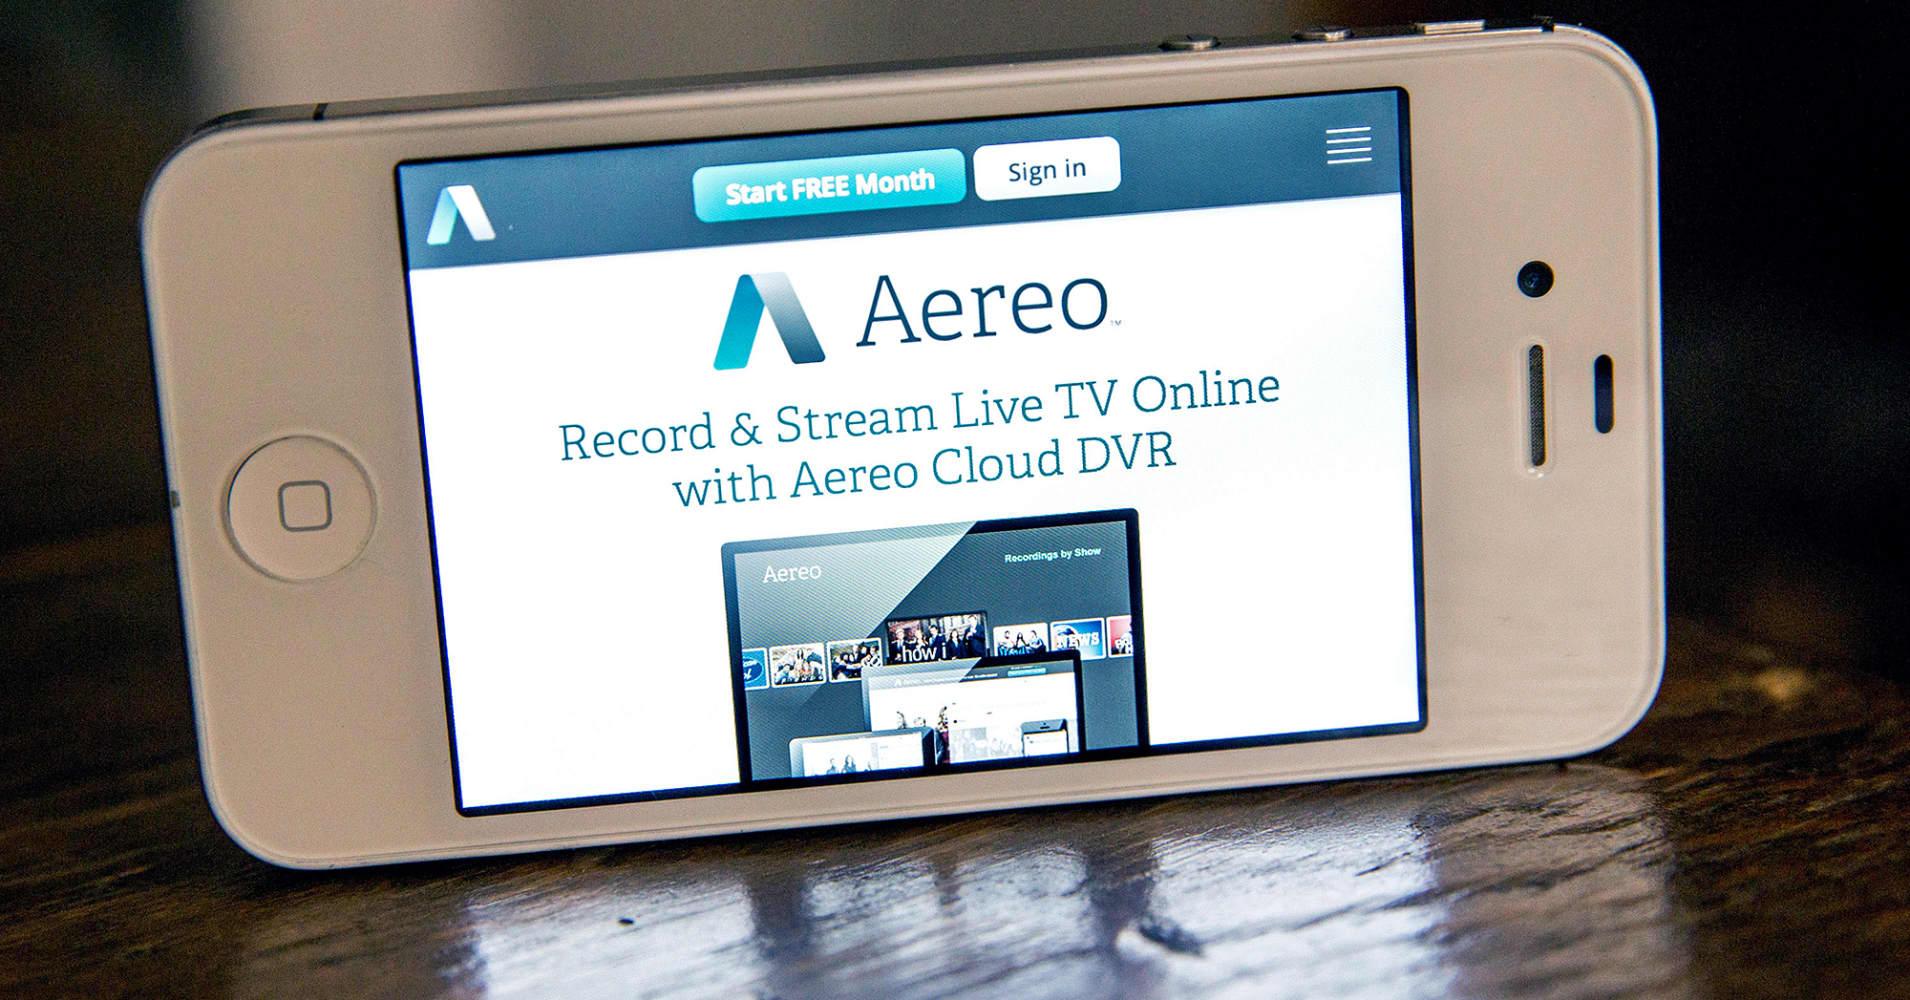 Aereo stock options